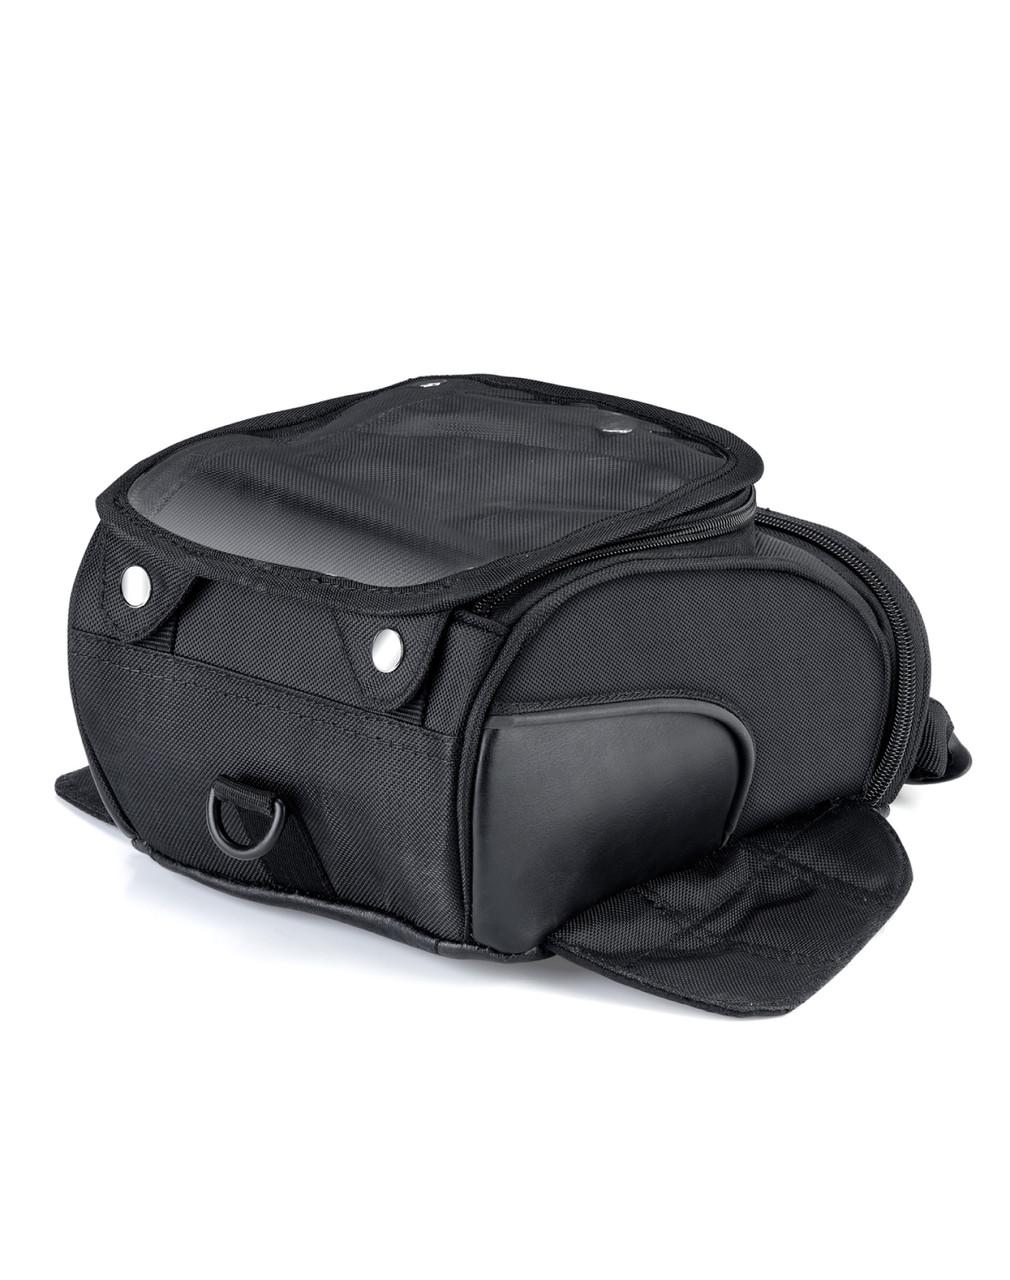 Viking 14 Medium Black Street/Sportbike Tank Bag Back Side View